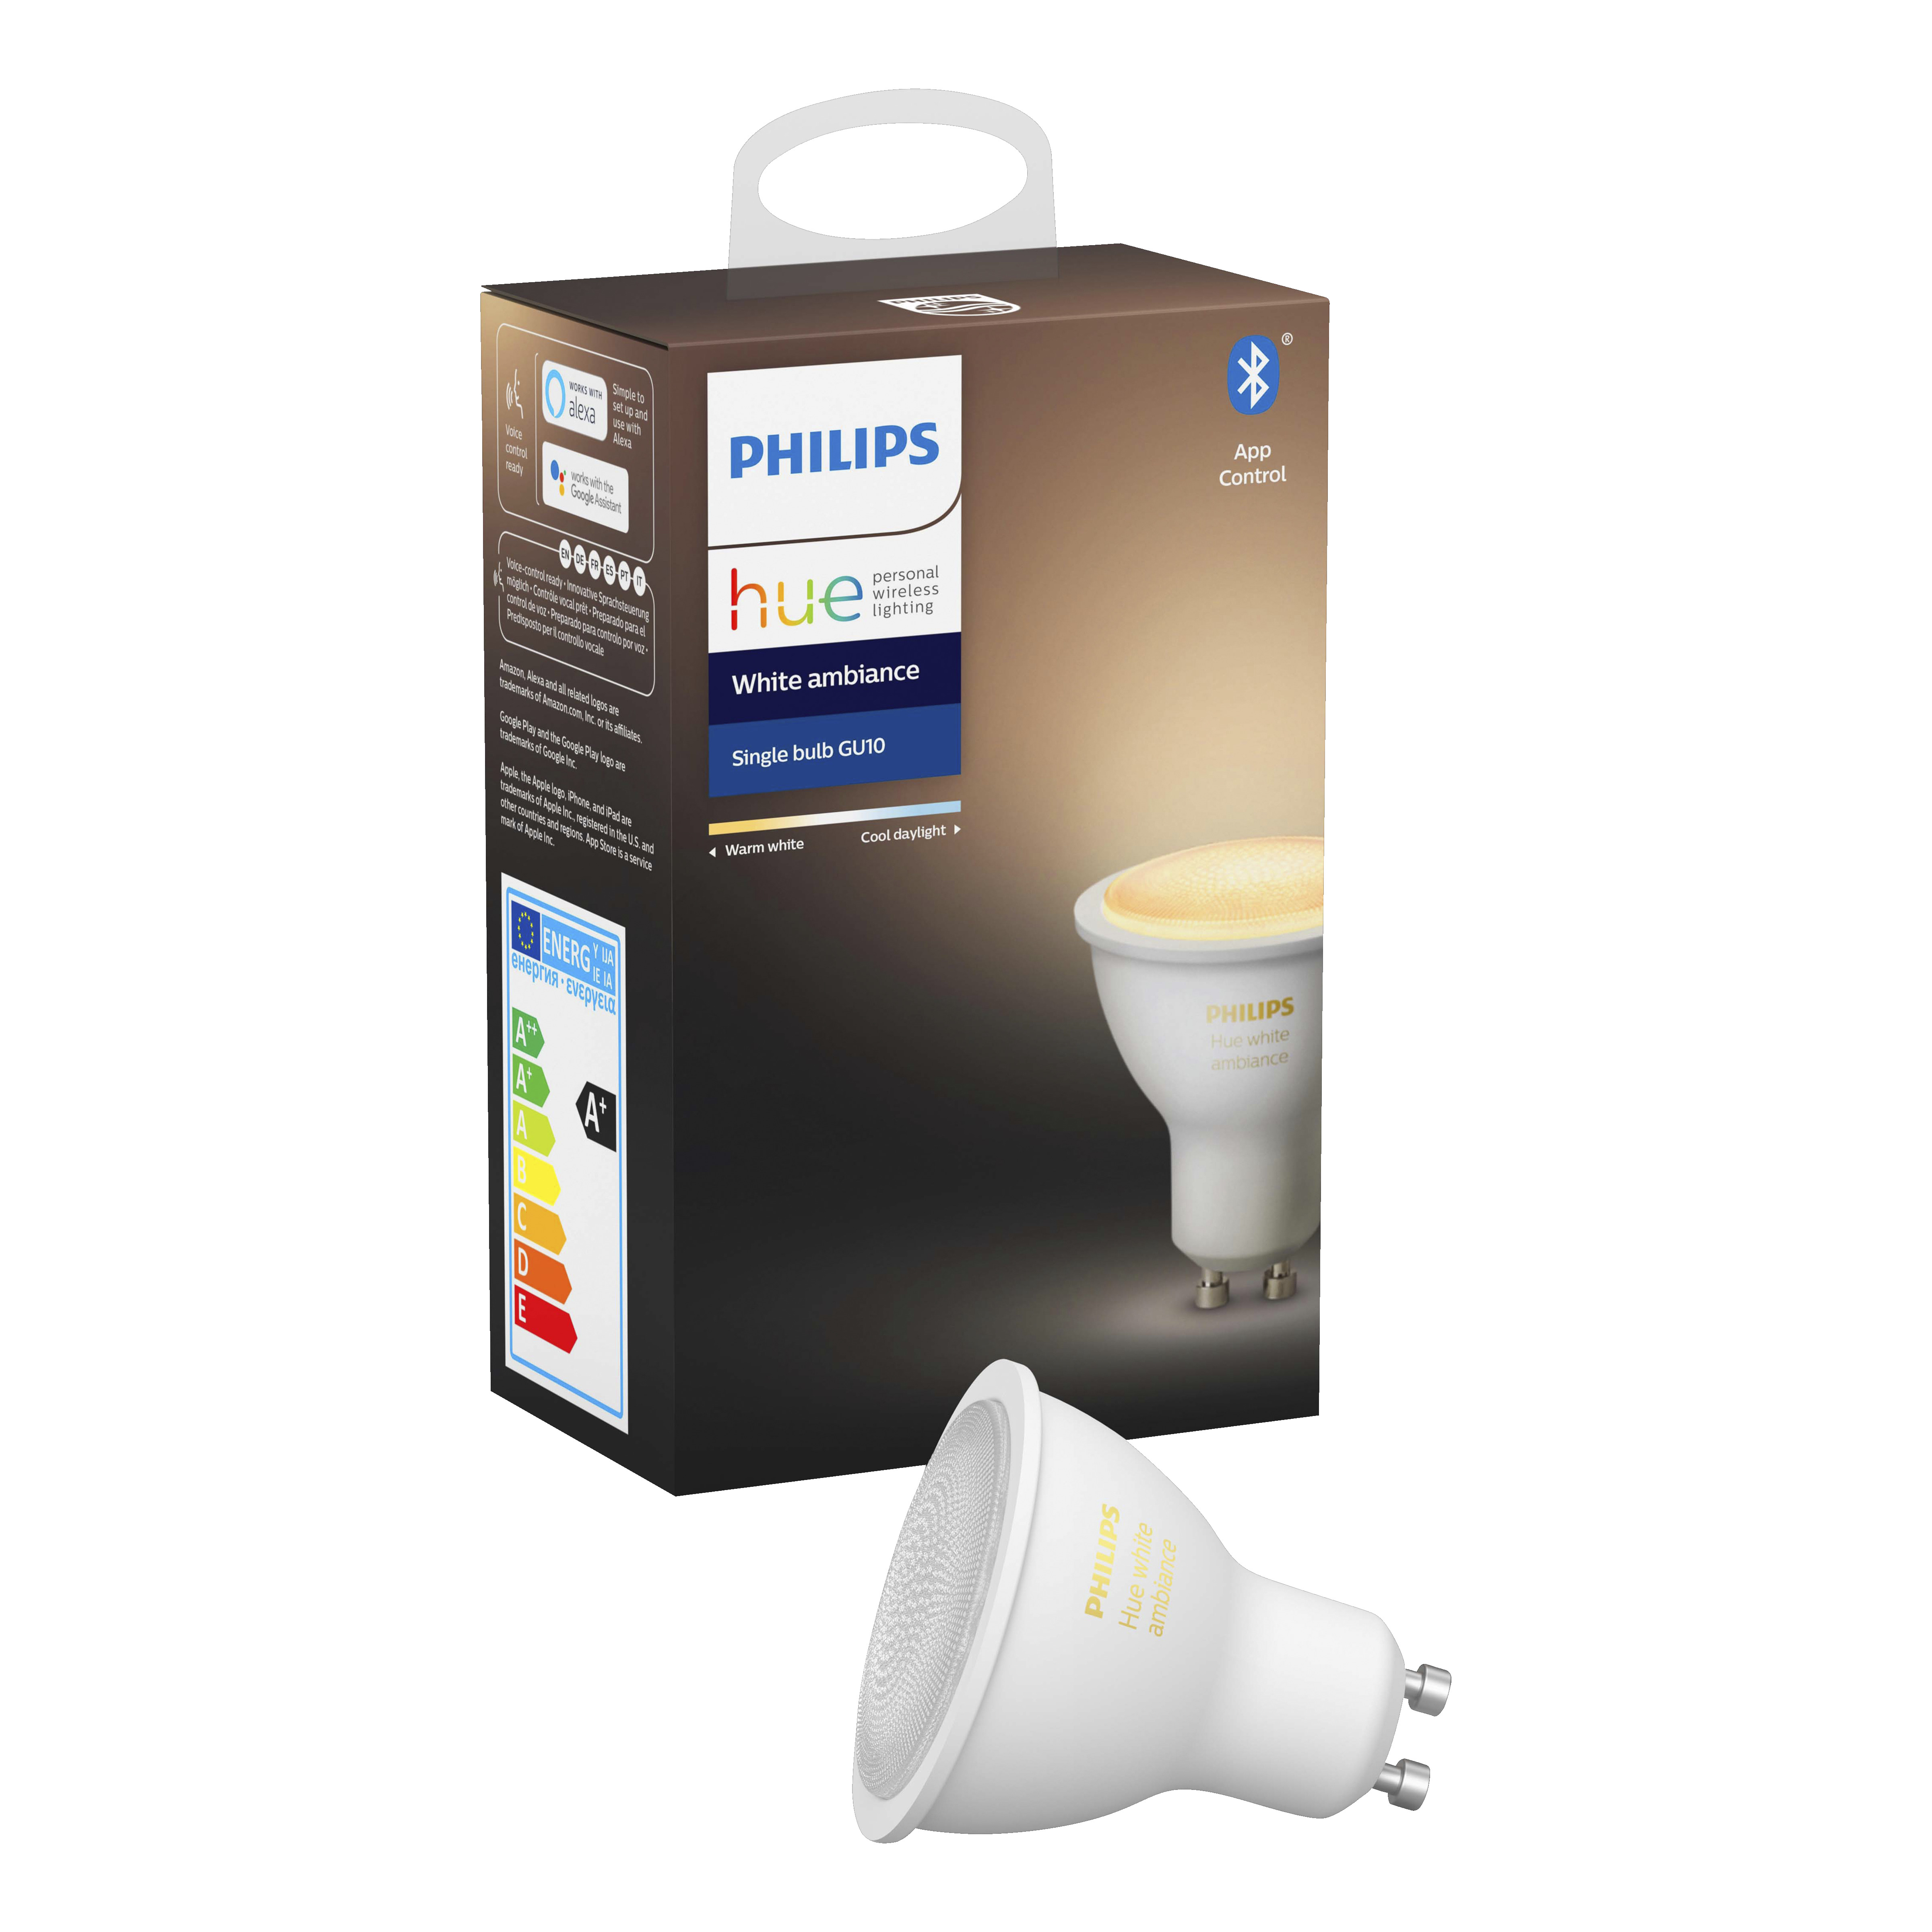 PHILIPS HUE Philips Hue spot warm tot koelwit licht 1-pack